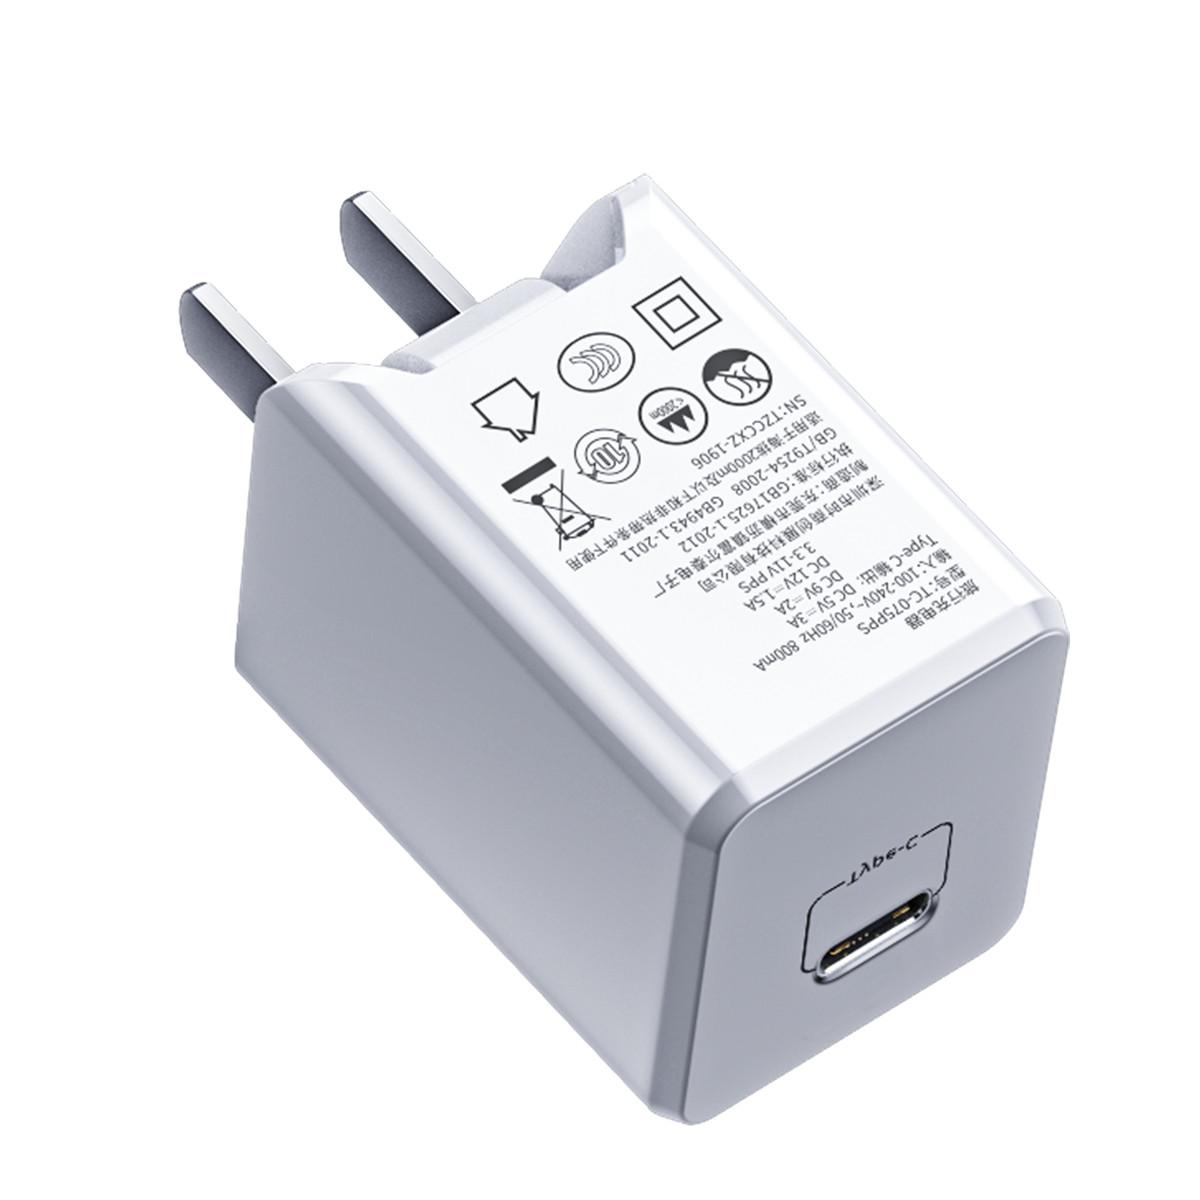 Bộ sạc nhanh cho iPhone 7/8 Plus/X/XS/XS Max Baseus Traveler PD quick charger suit 18W(Type-C to IP 1M Cable)(US) TZCCXZ-02 - Hàng Chính Hãng - White